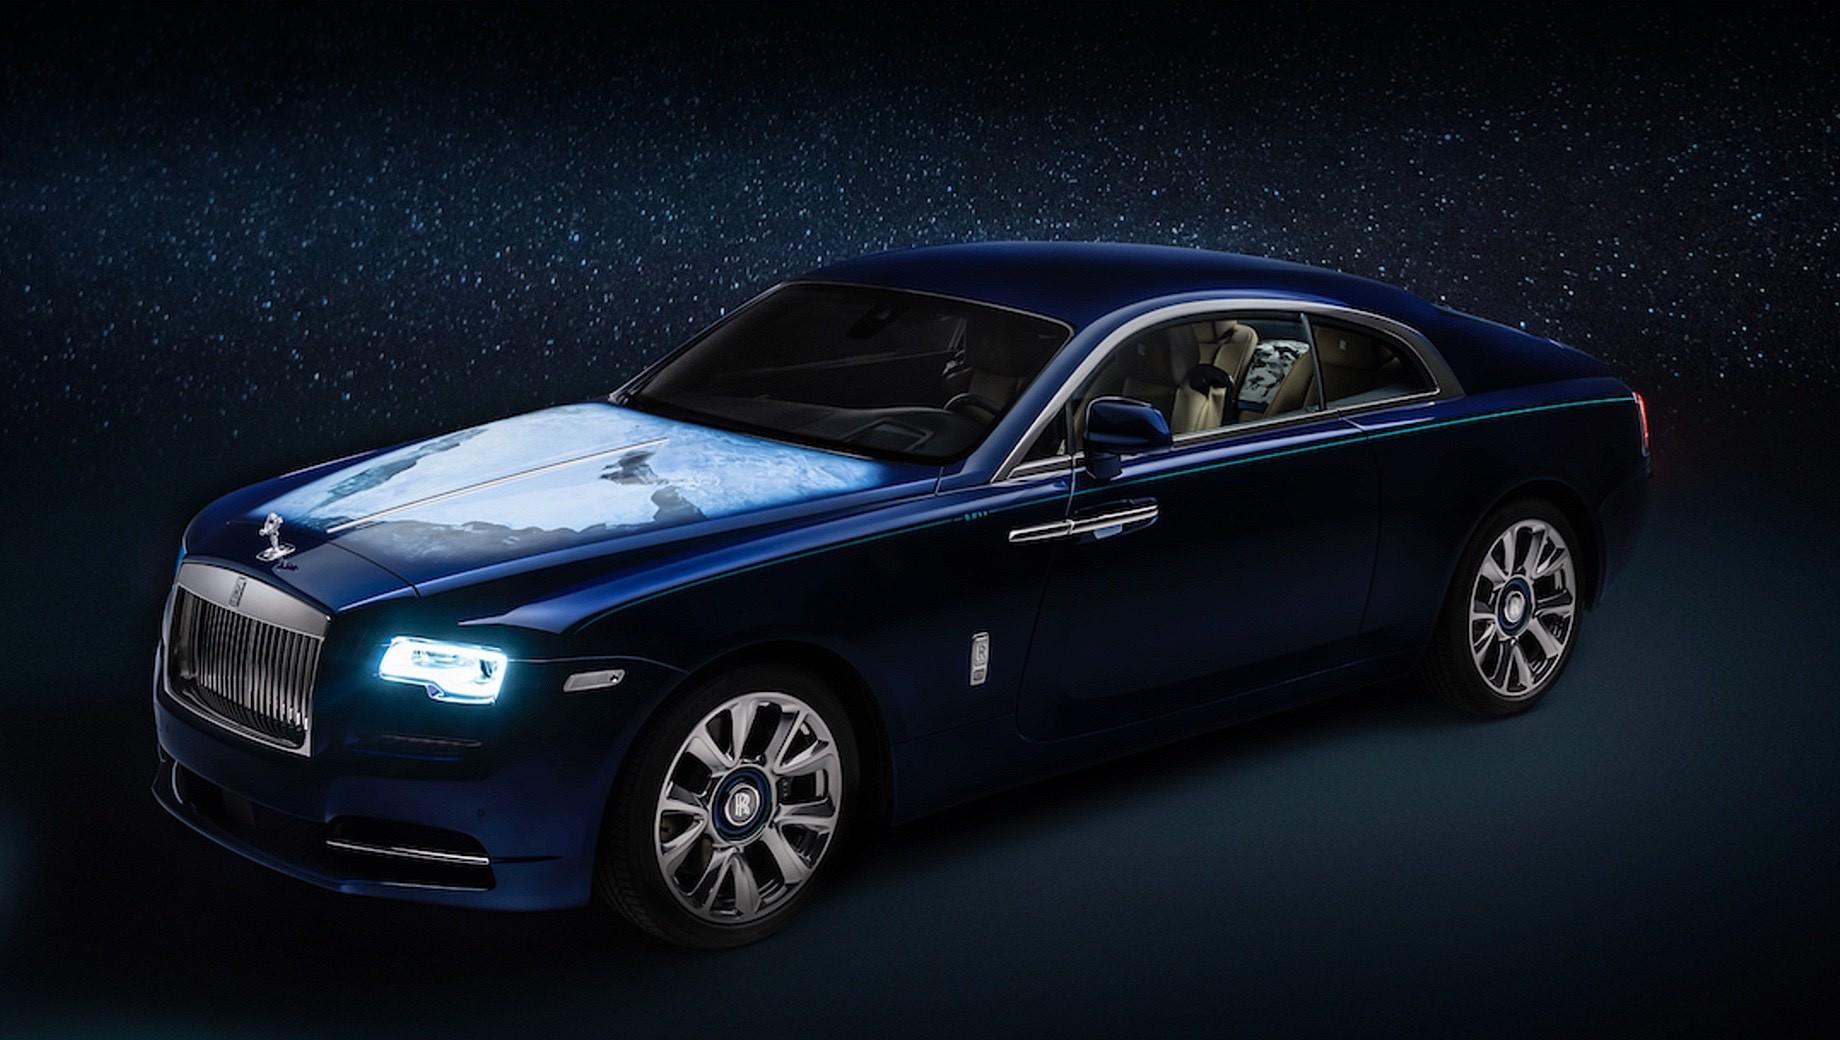 Rolls-Royce Wraith Inspired by Earth обозначил центр мира в ОАЭ